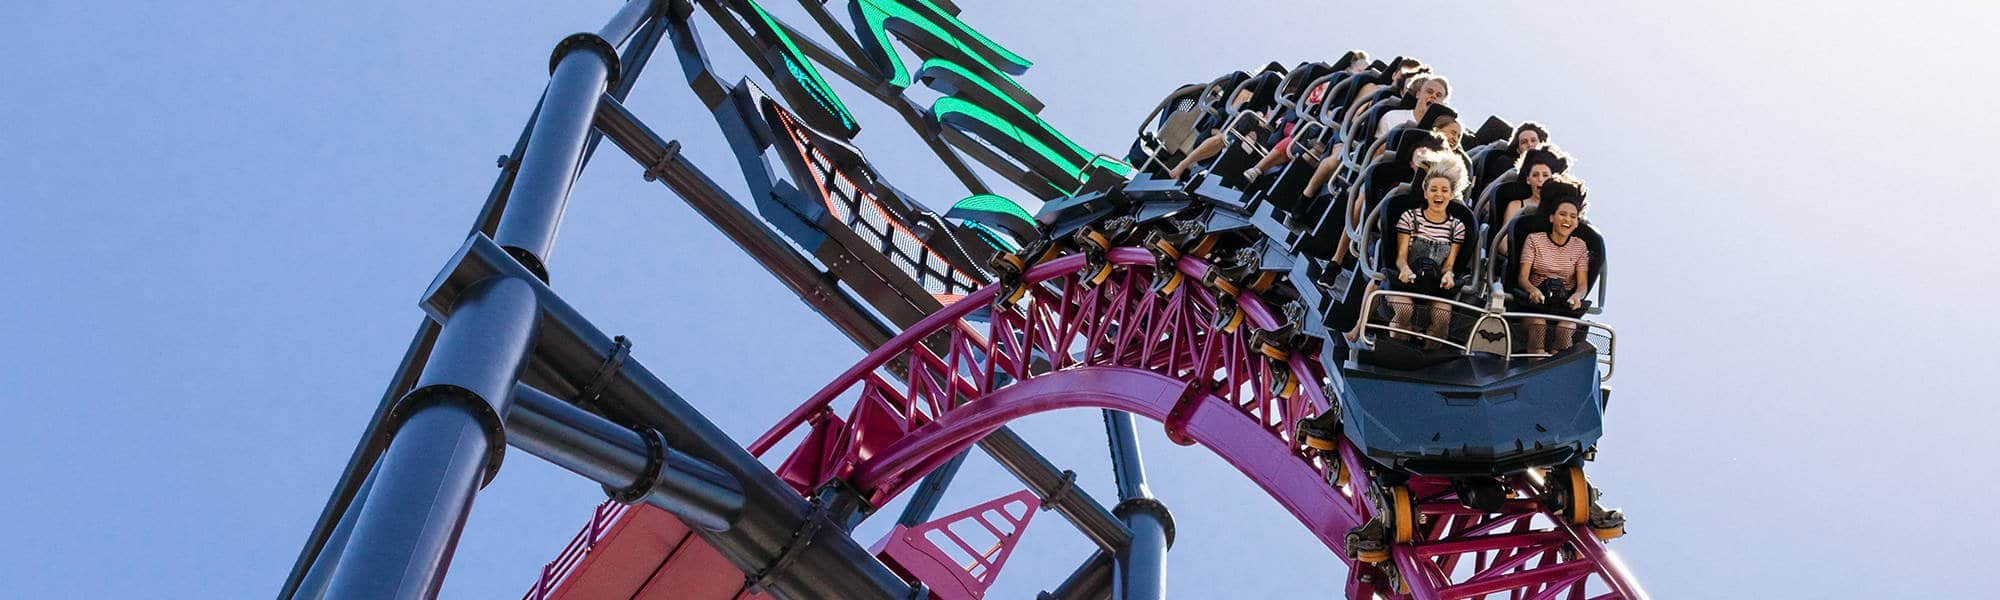 marketing roller coaster